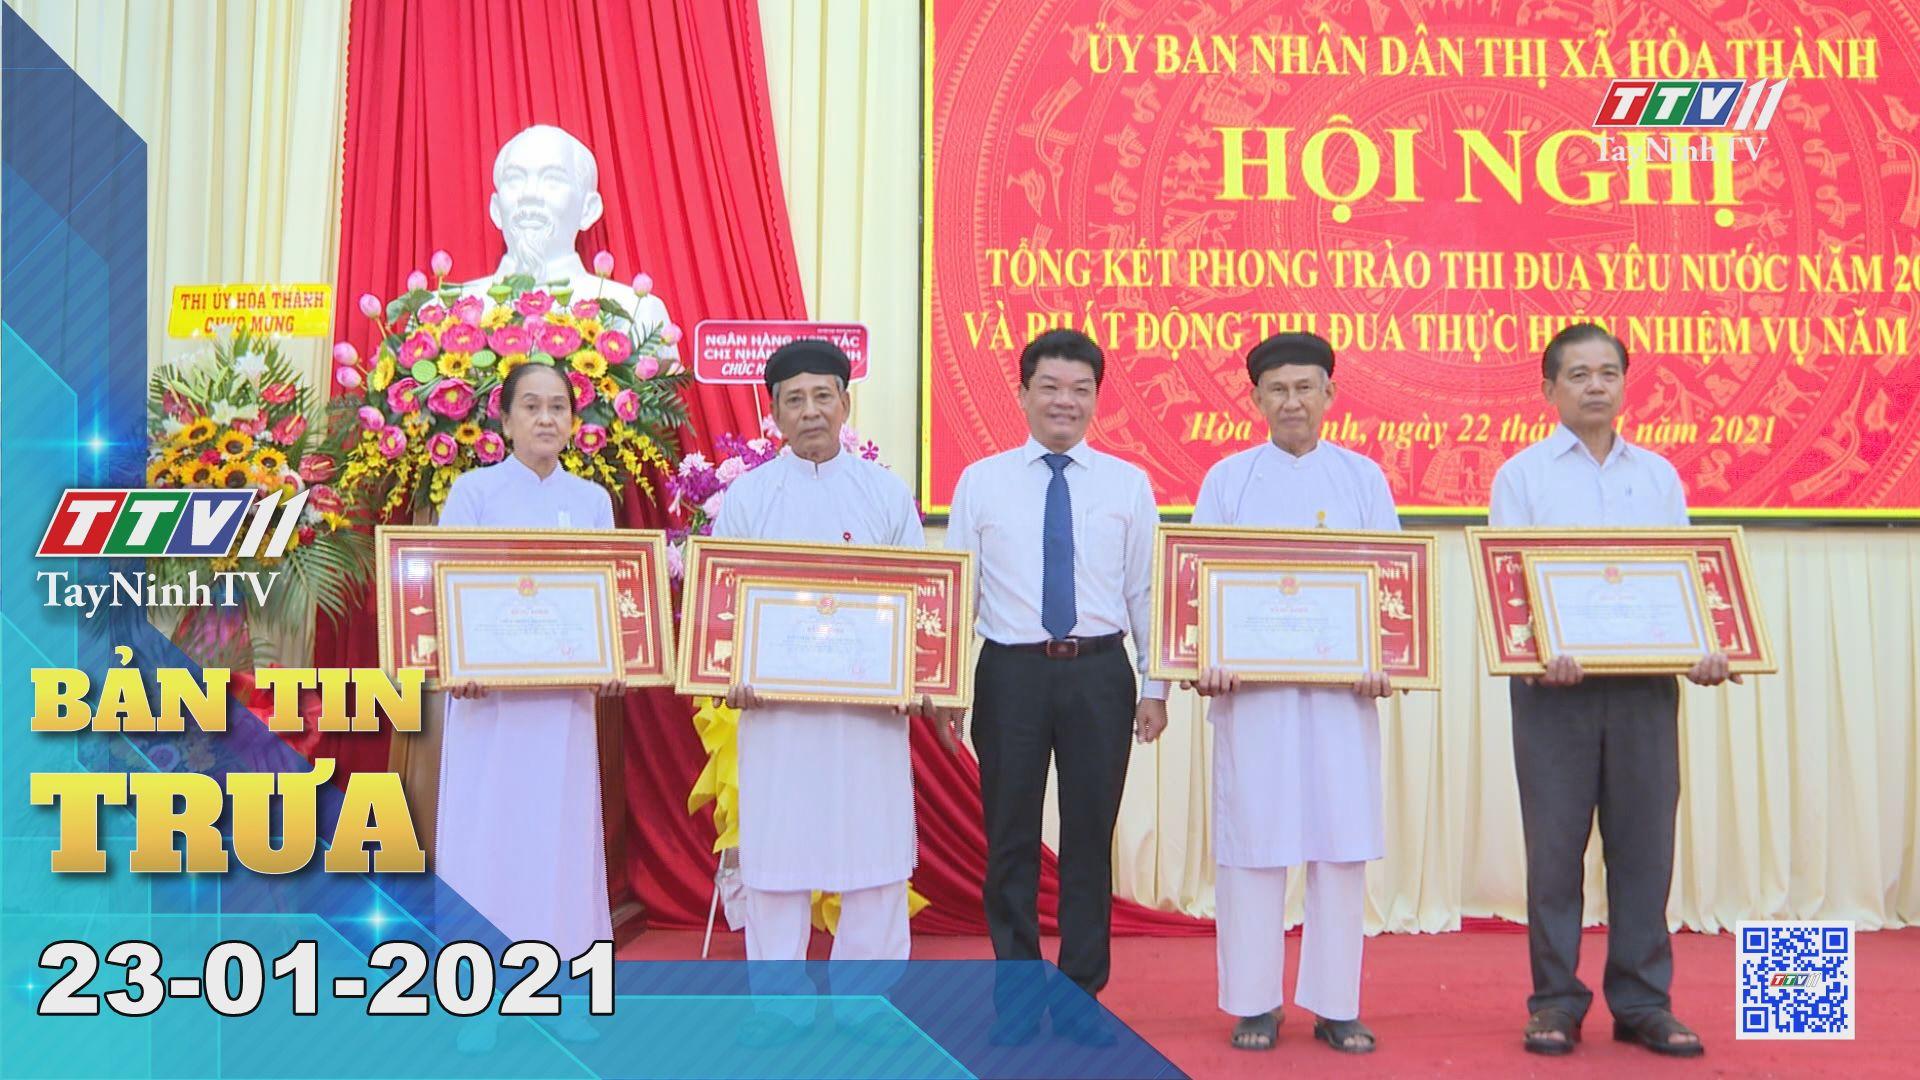 Bản tin trưa 23-01-2021 | Tin tức hôm nay | TayNinhTV